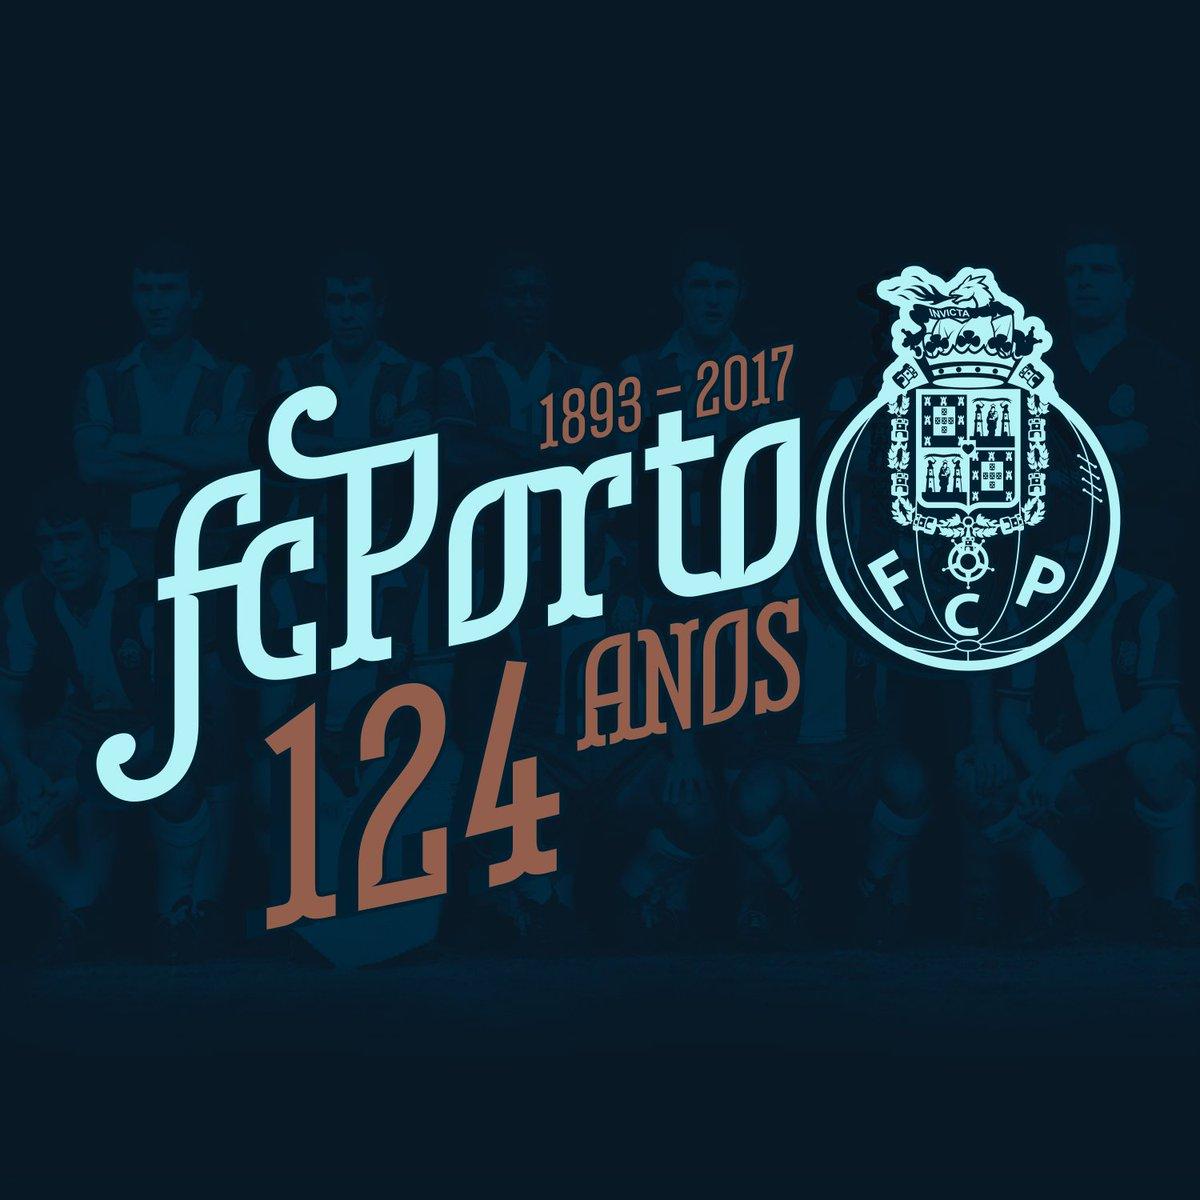 124.º Aniversário!   #FCPorto #FCPorto124